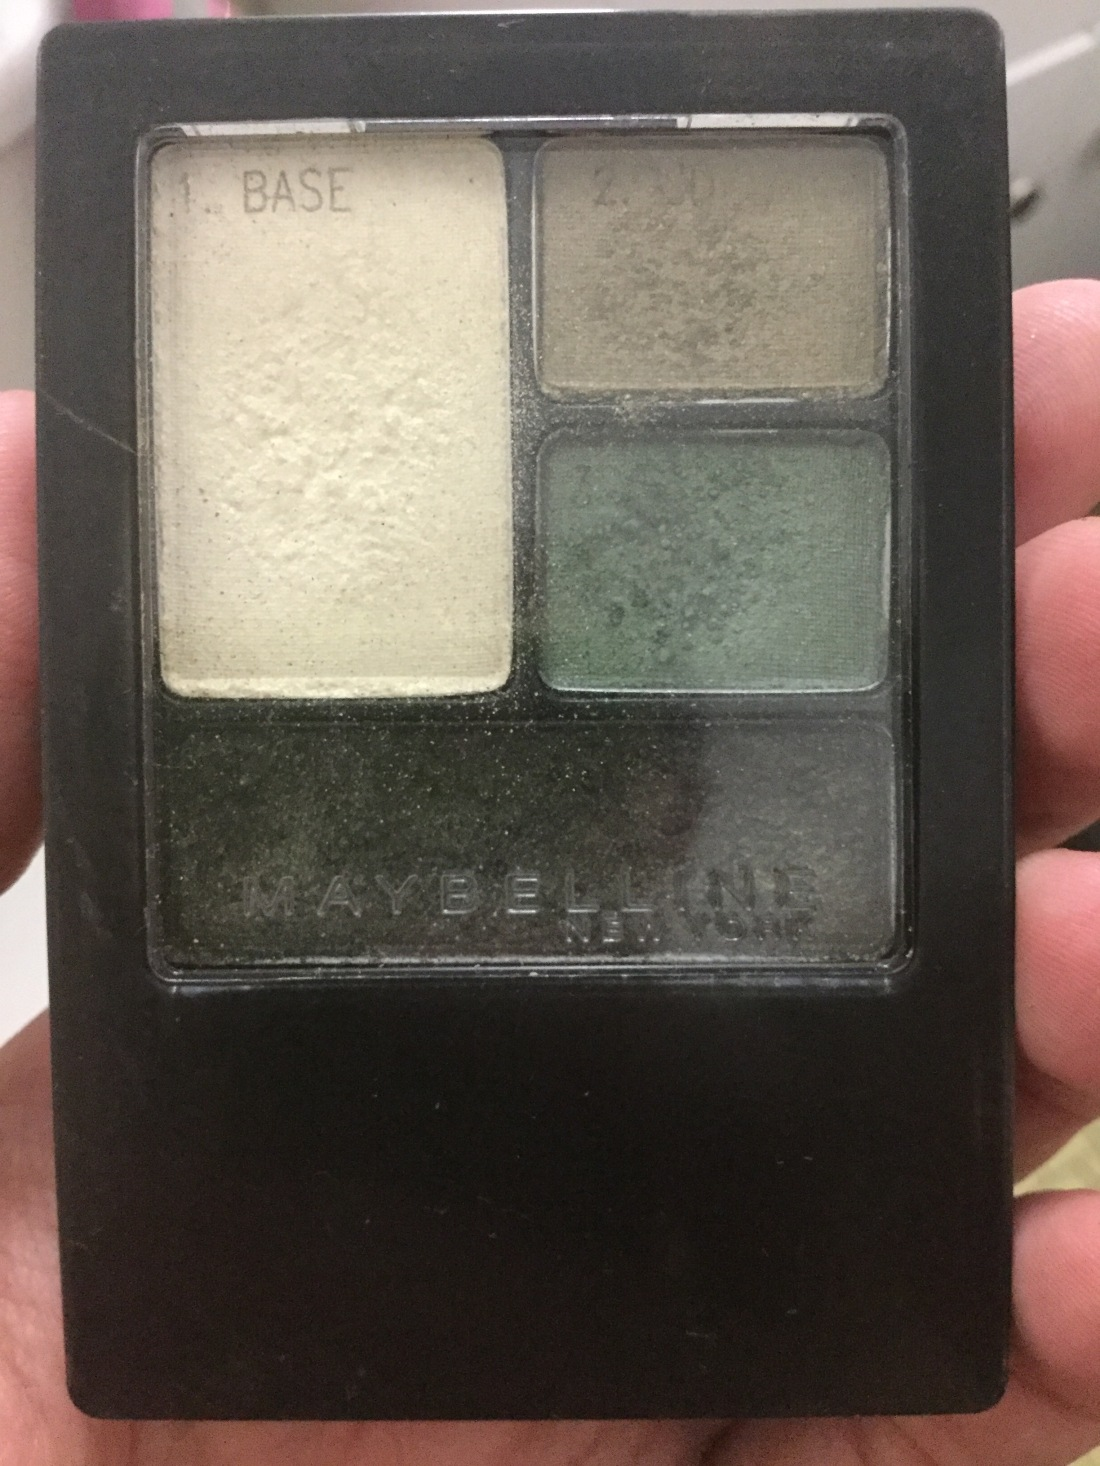 Green eyeshadow palette